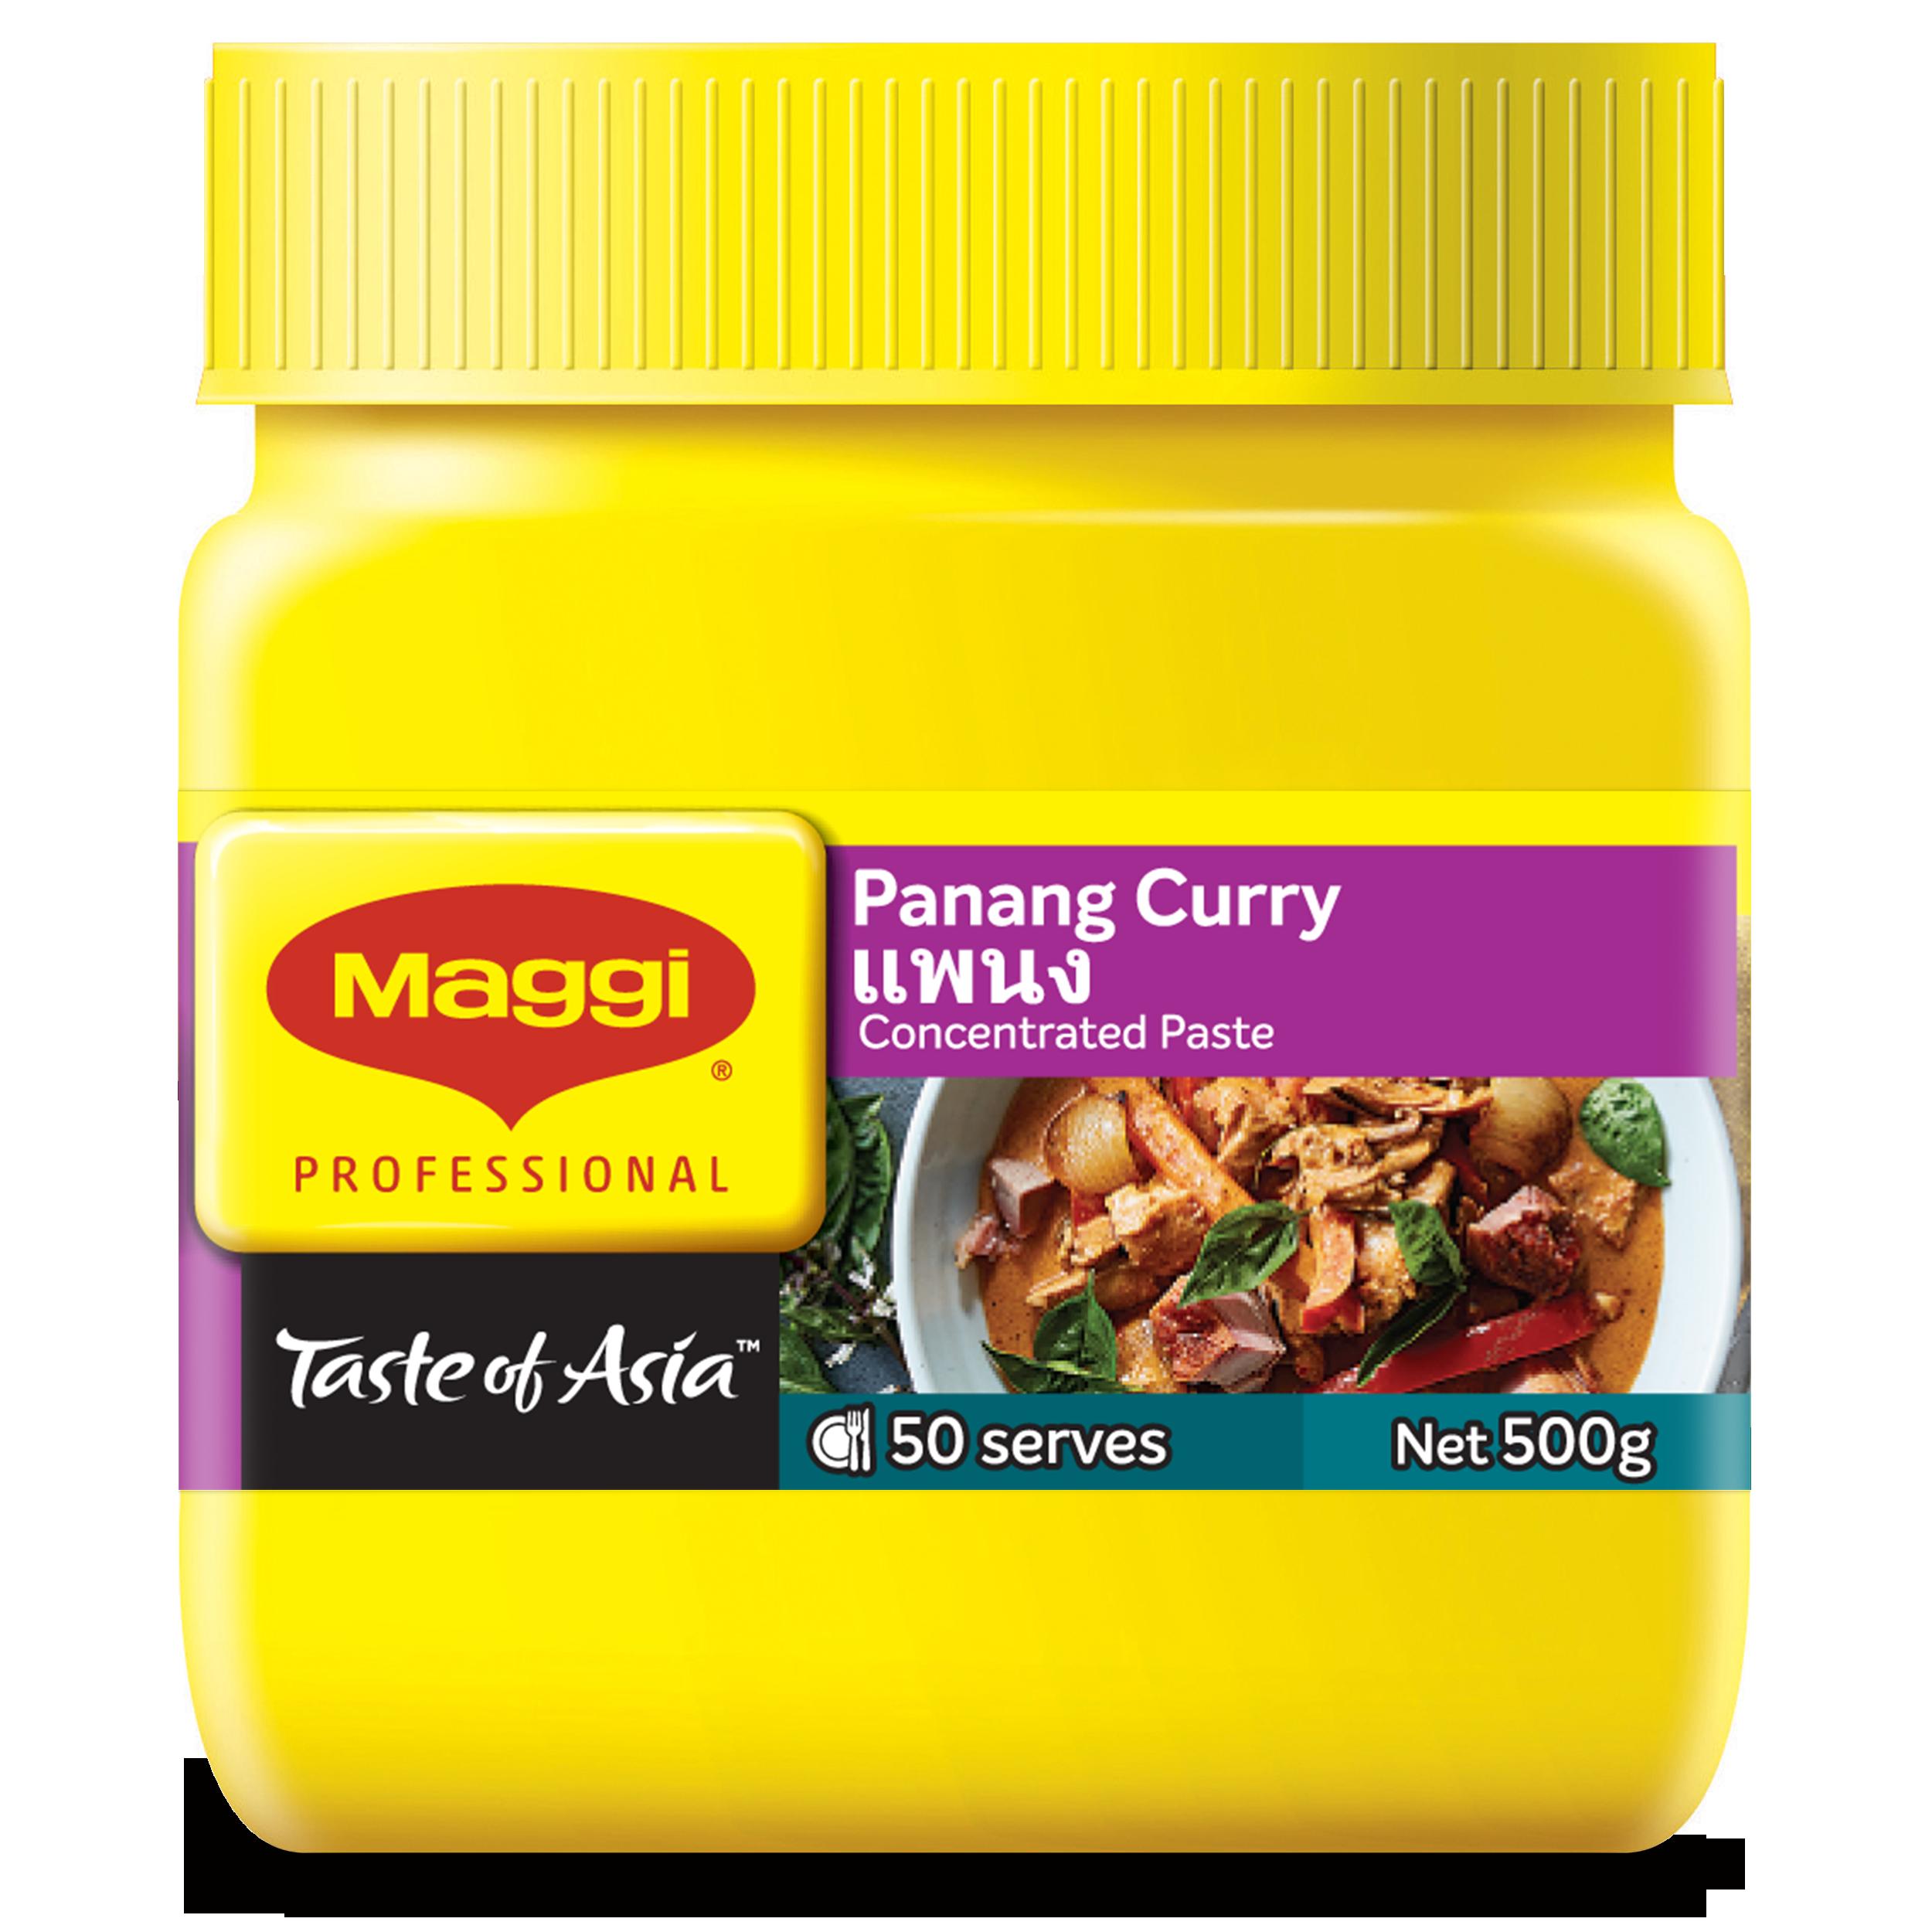 12386743 MAGGI TASTE OF ASIA Panang Curry Paste_500g.png